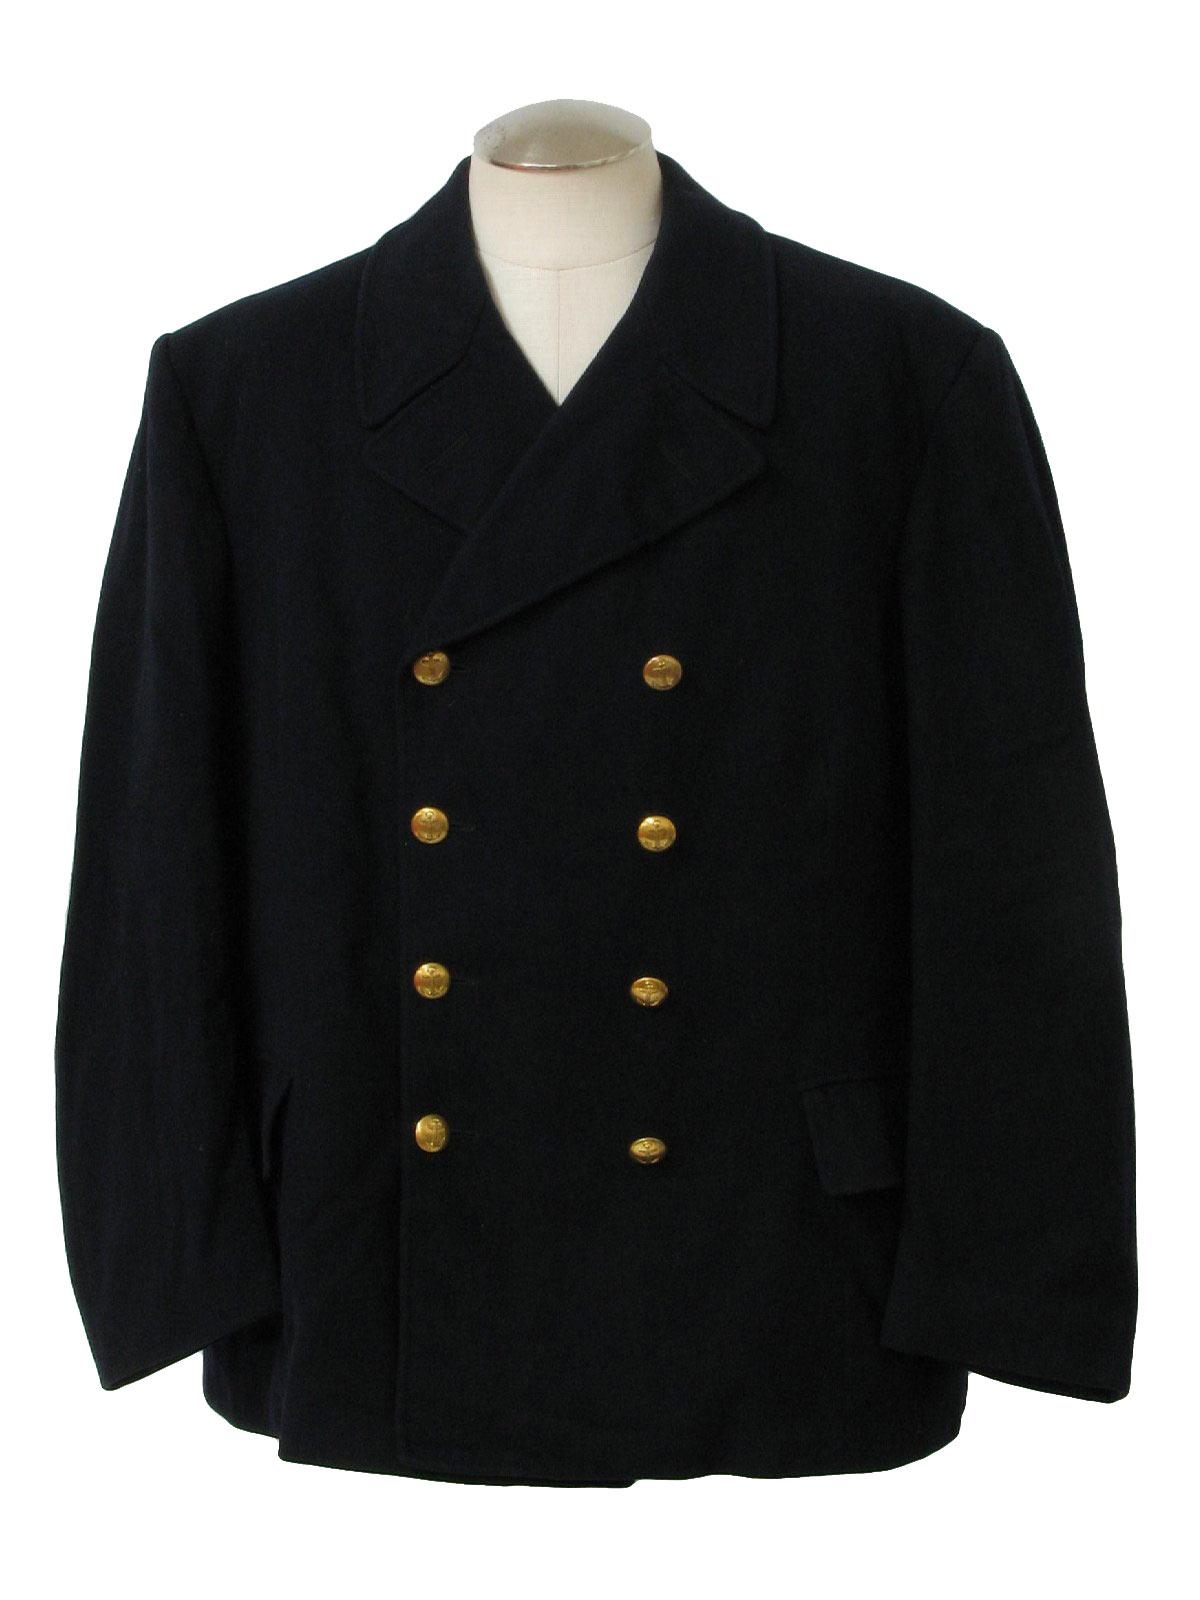 Retro 1950's Jacket (Rappson) : 50s -Rappson- Mens dark midnight ...